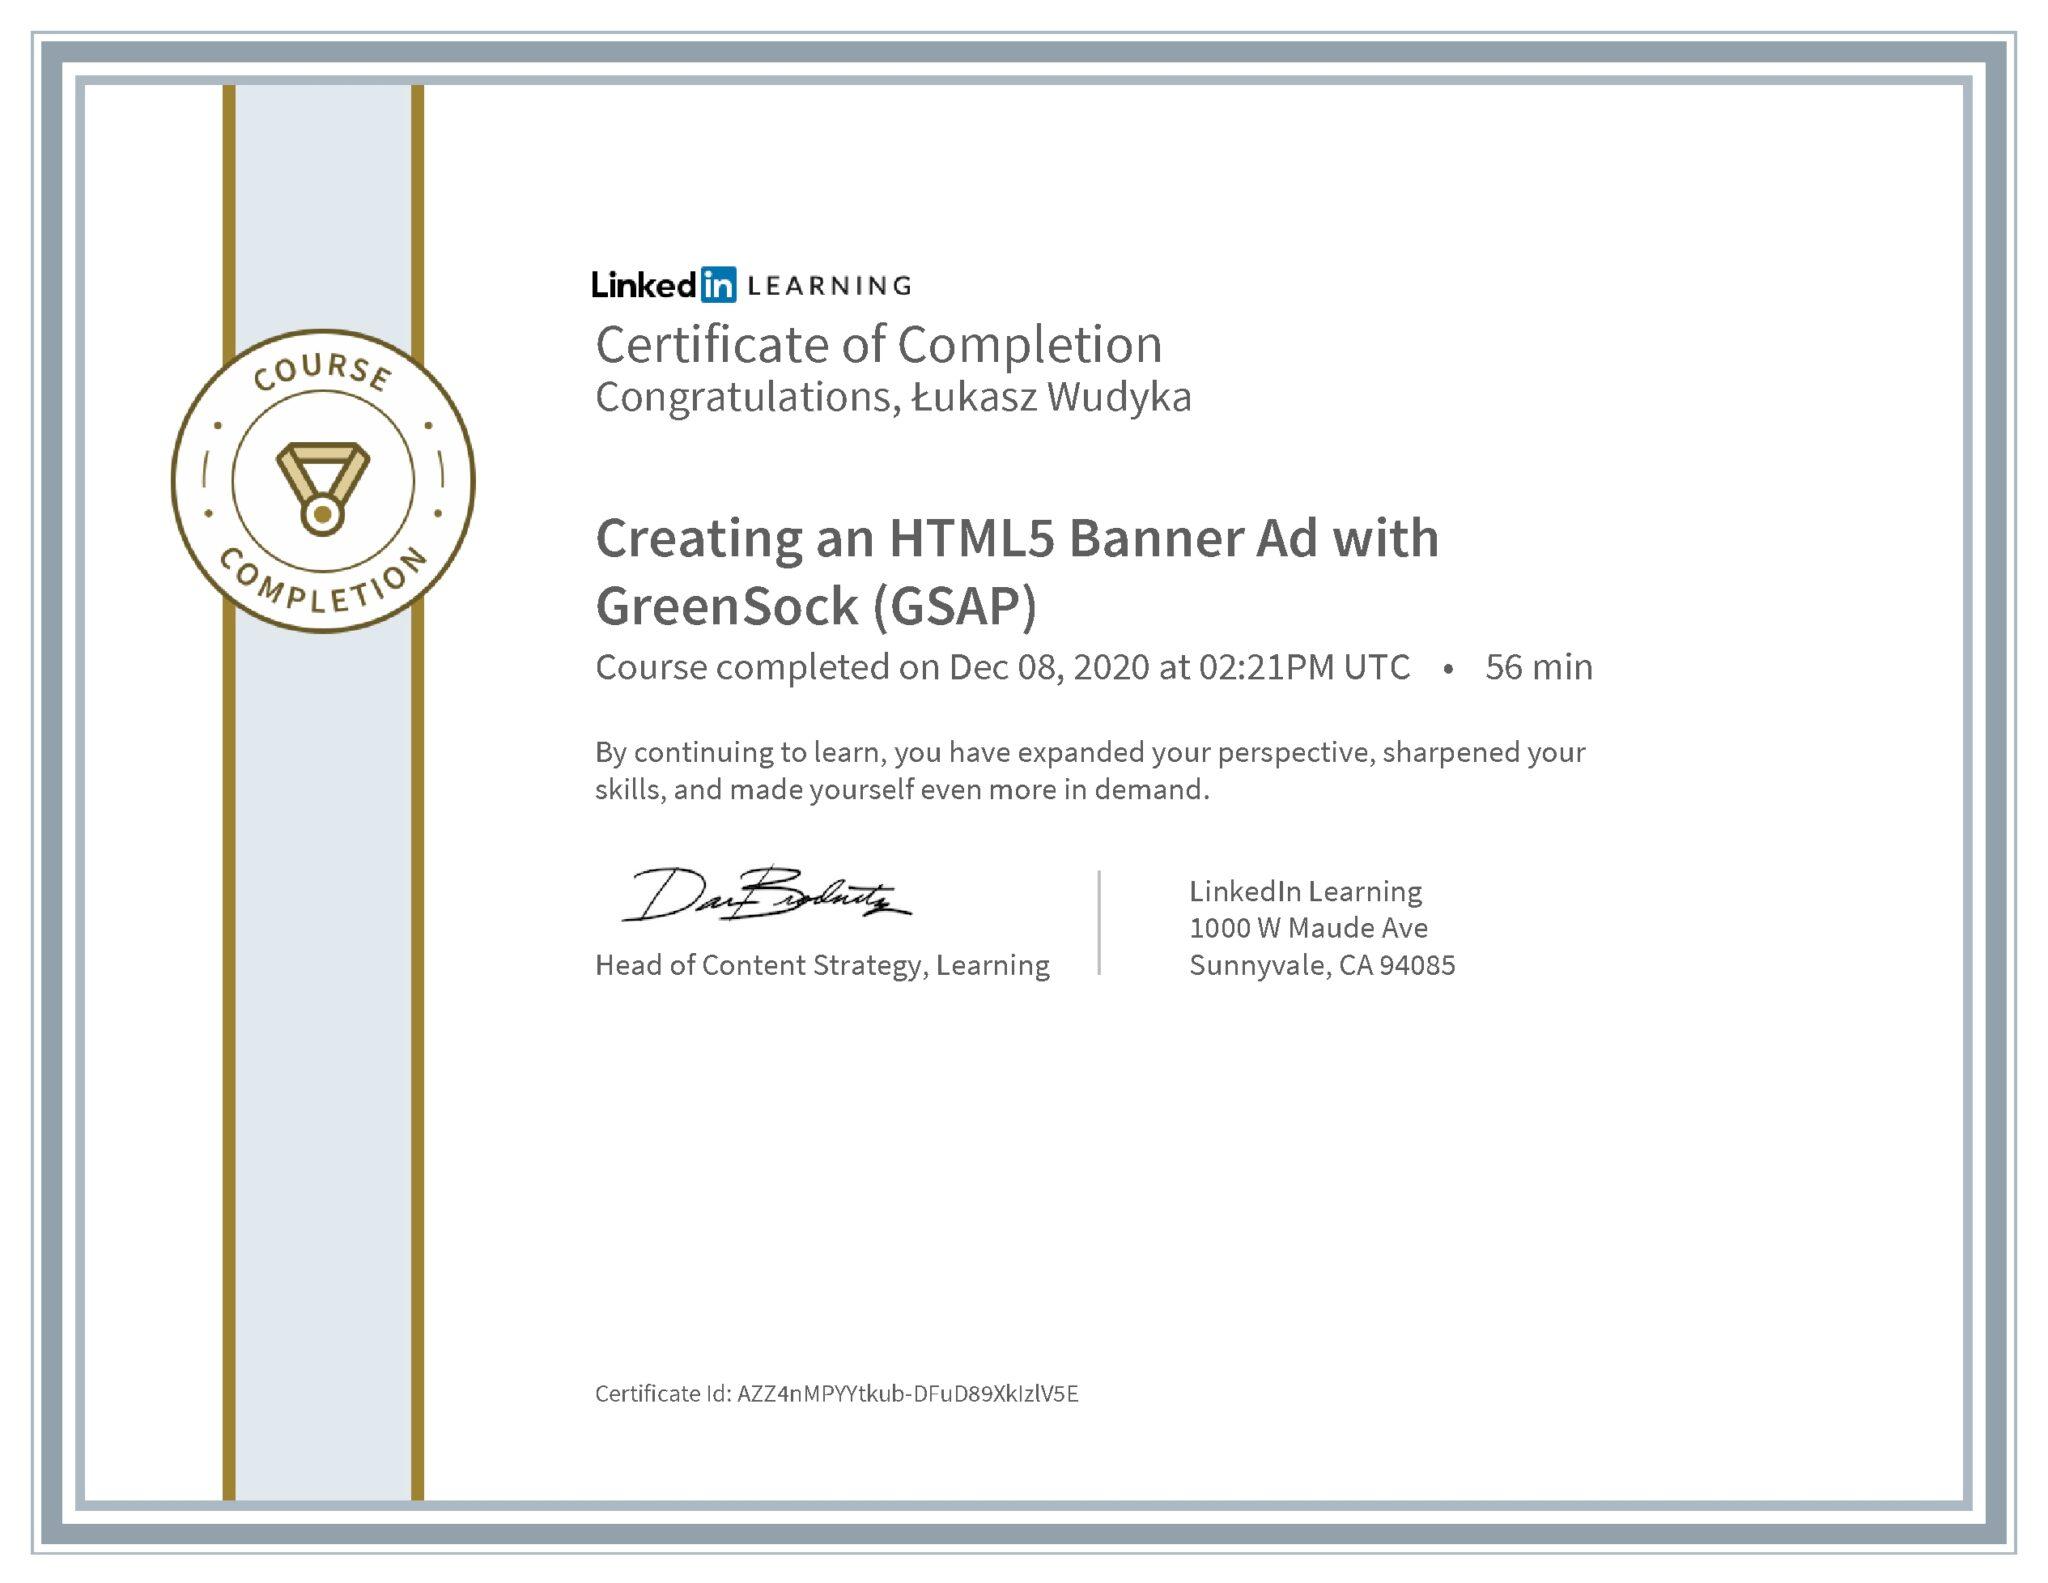 Łukasz Wudyka certyfikat LinkedIn Creating an HTML5 Banner Ad with GreenSock (GSAP)